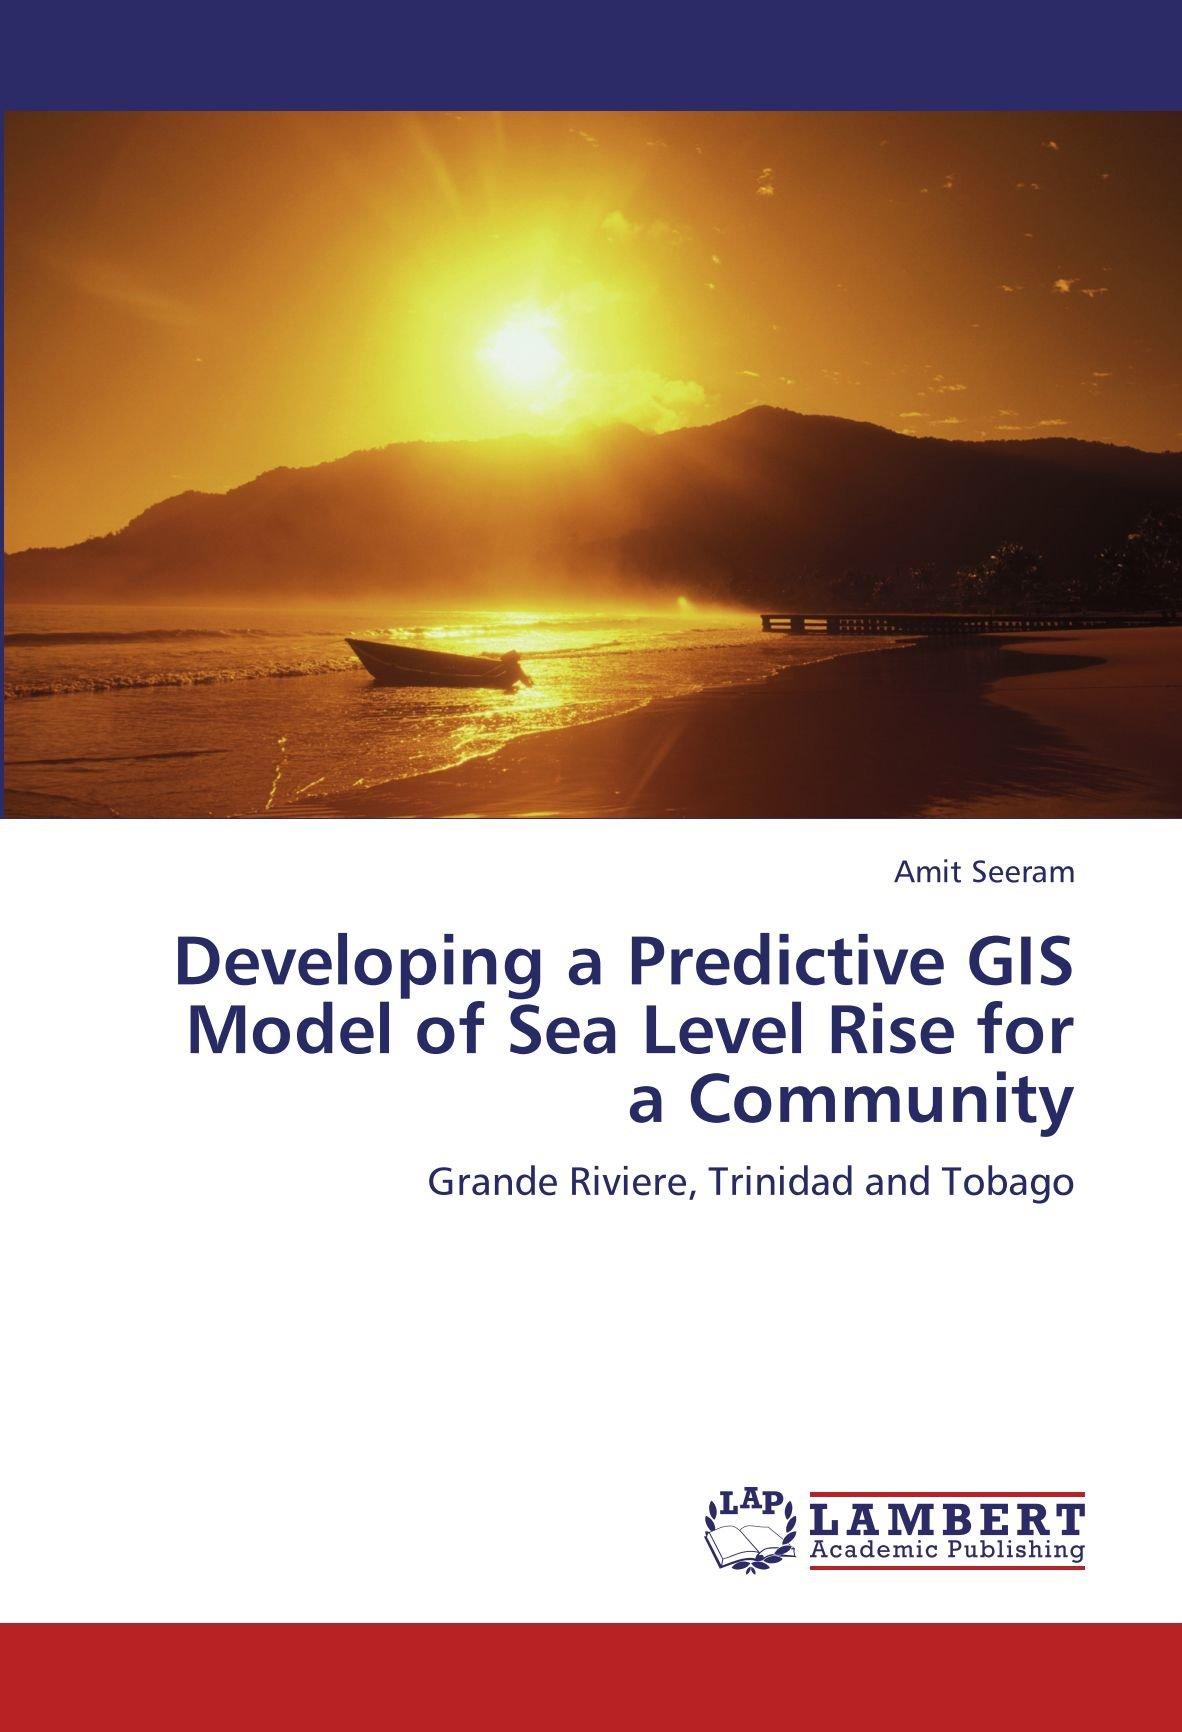 Developing a Predictive GIS Model of Sea Level Rise for a Community: Grande Riviere, Trinidad and Tobago pdf